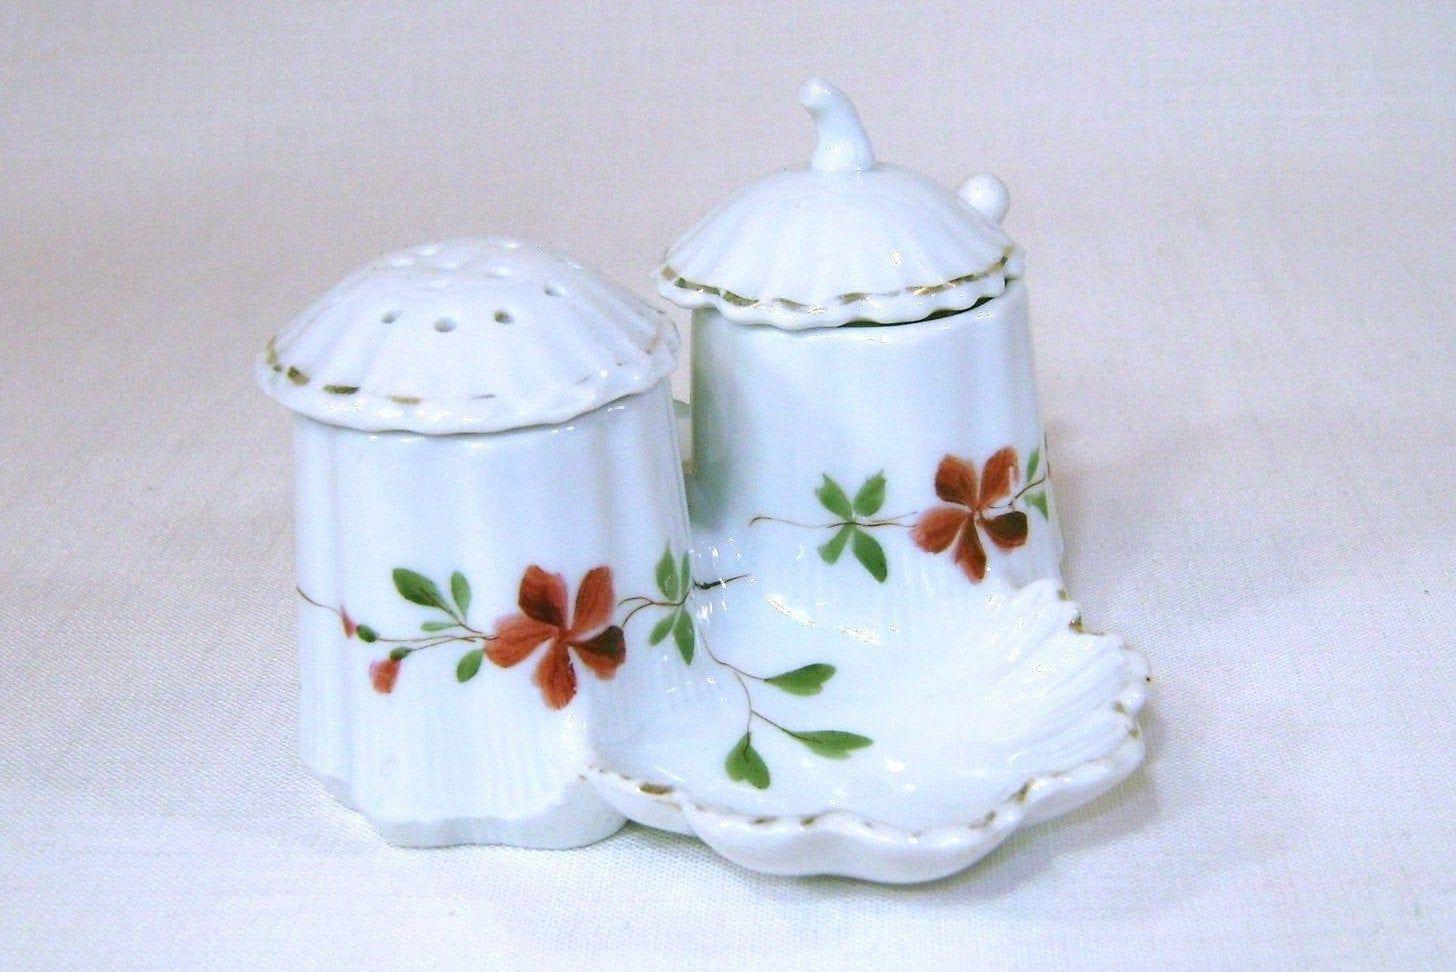 Antique Bavarian Porcelain Cruet Set With Salt Dip Pepper Etsy Cruet Antiques Condiment Caddy